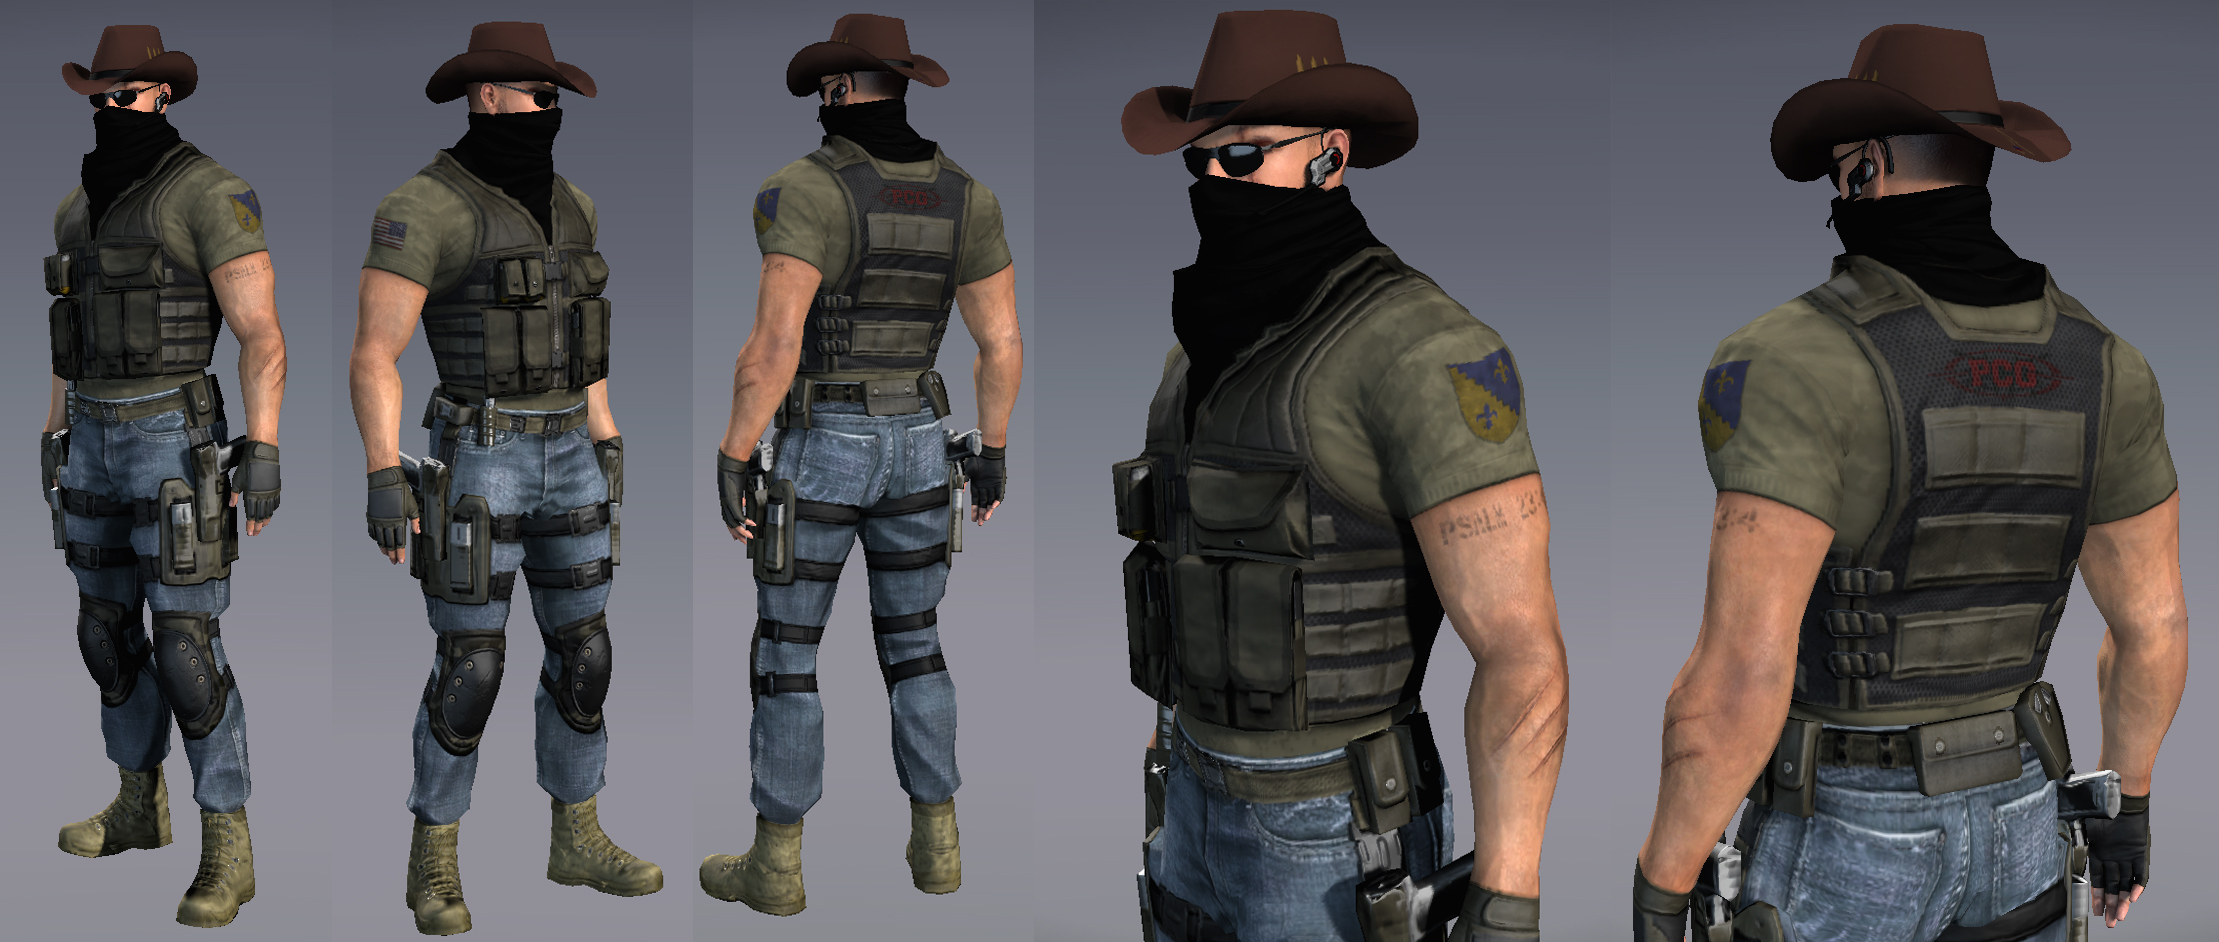 Mercenary (Black Flag Animi Avatar) | Assassin's Creed Wiki ...